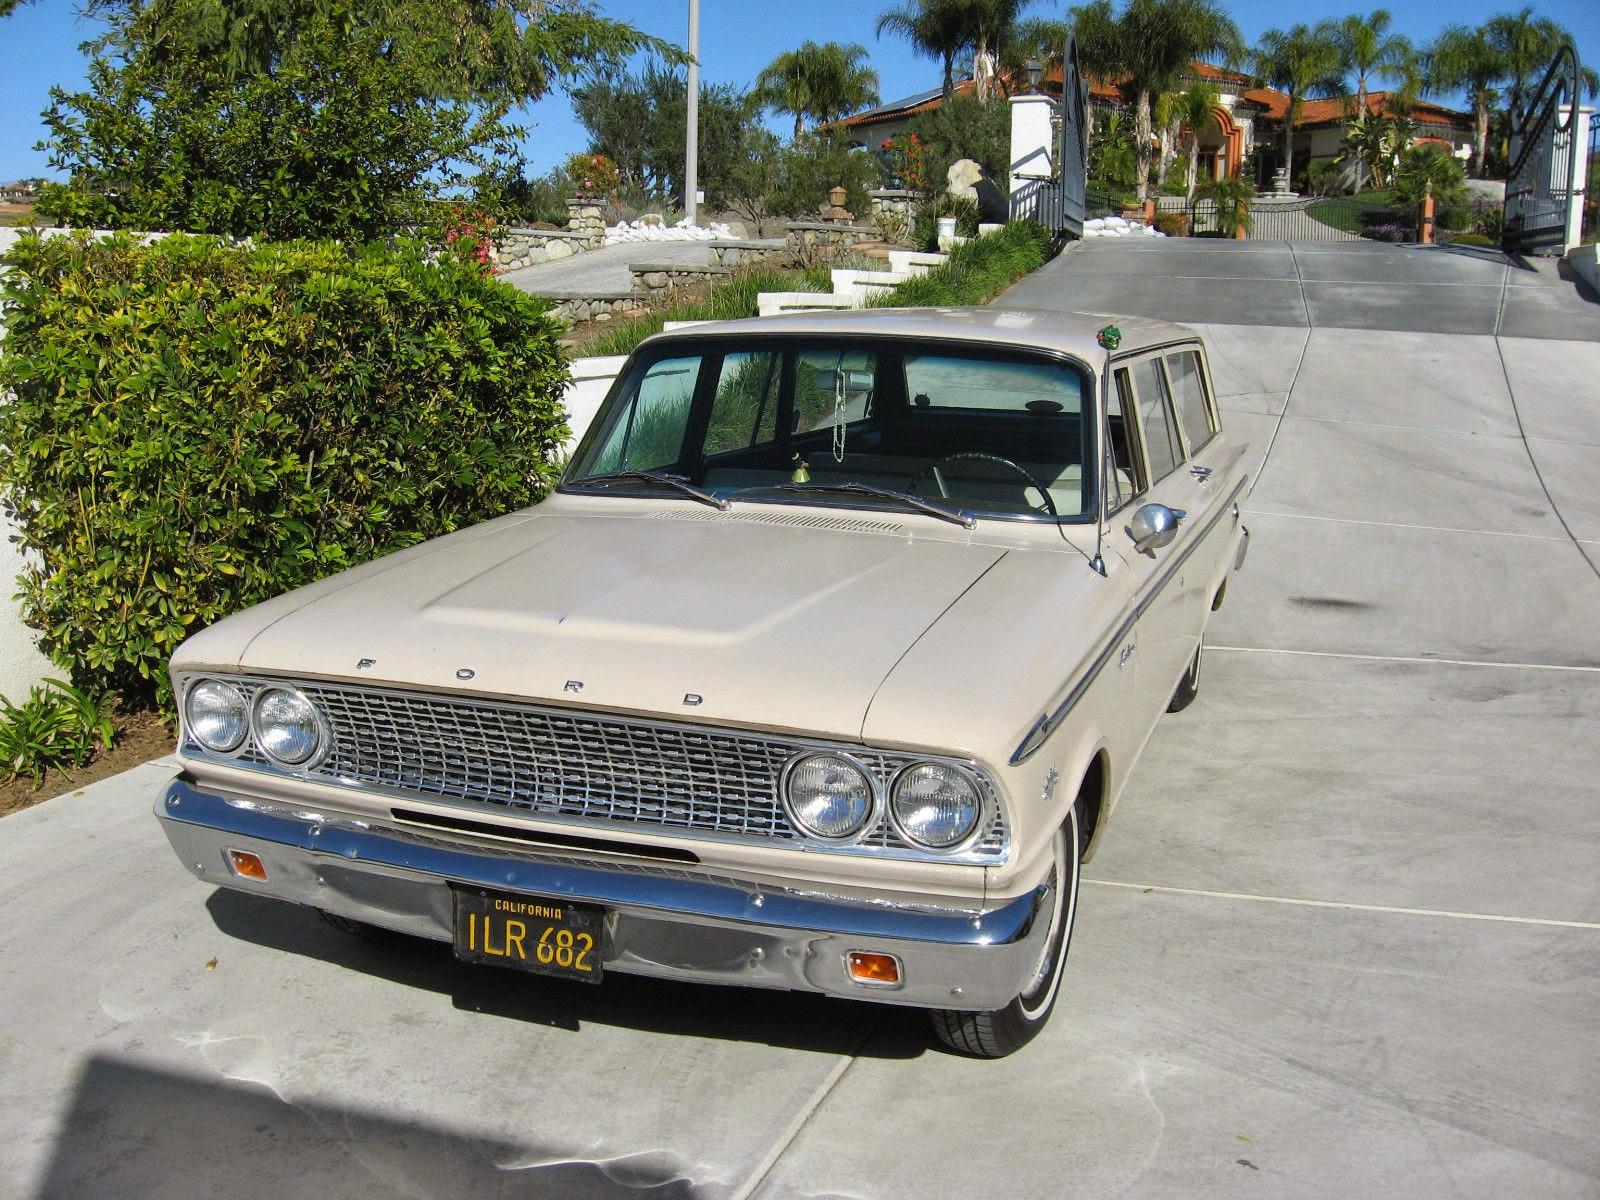 Wiring Diagram 1964 Ford Ranch Wagon Excellent Electrical 1957 1973 Nova Odicis Ranchero Galaxie